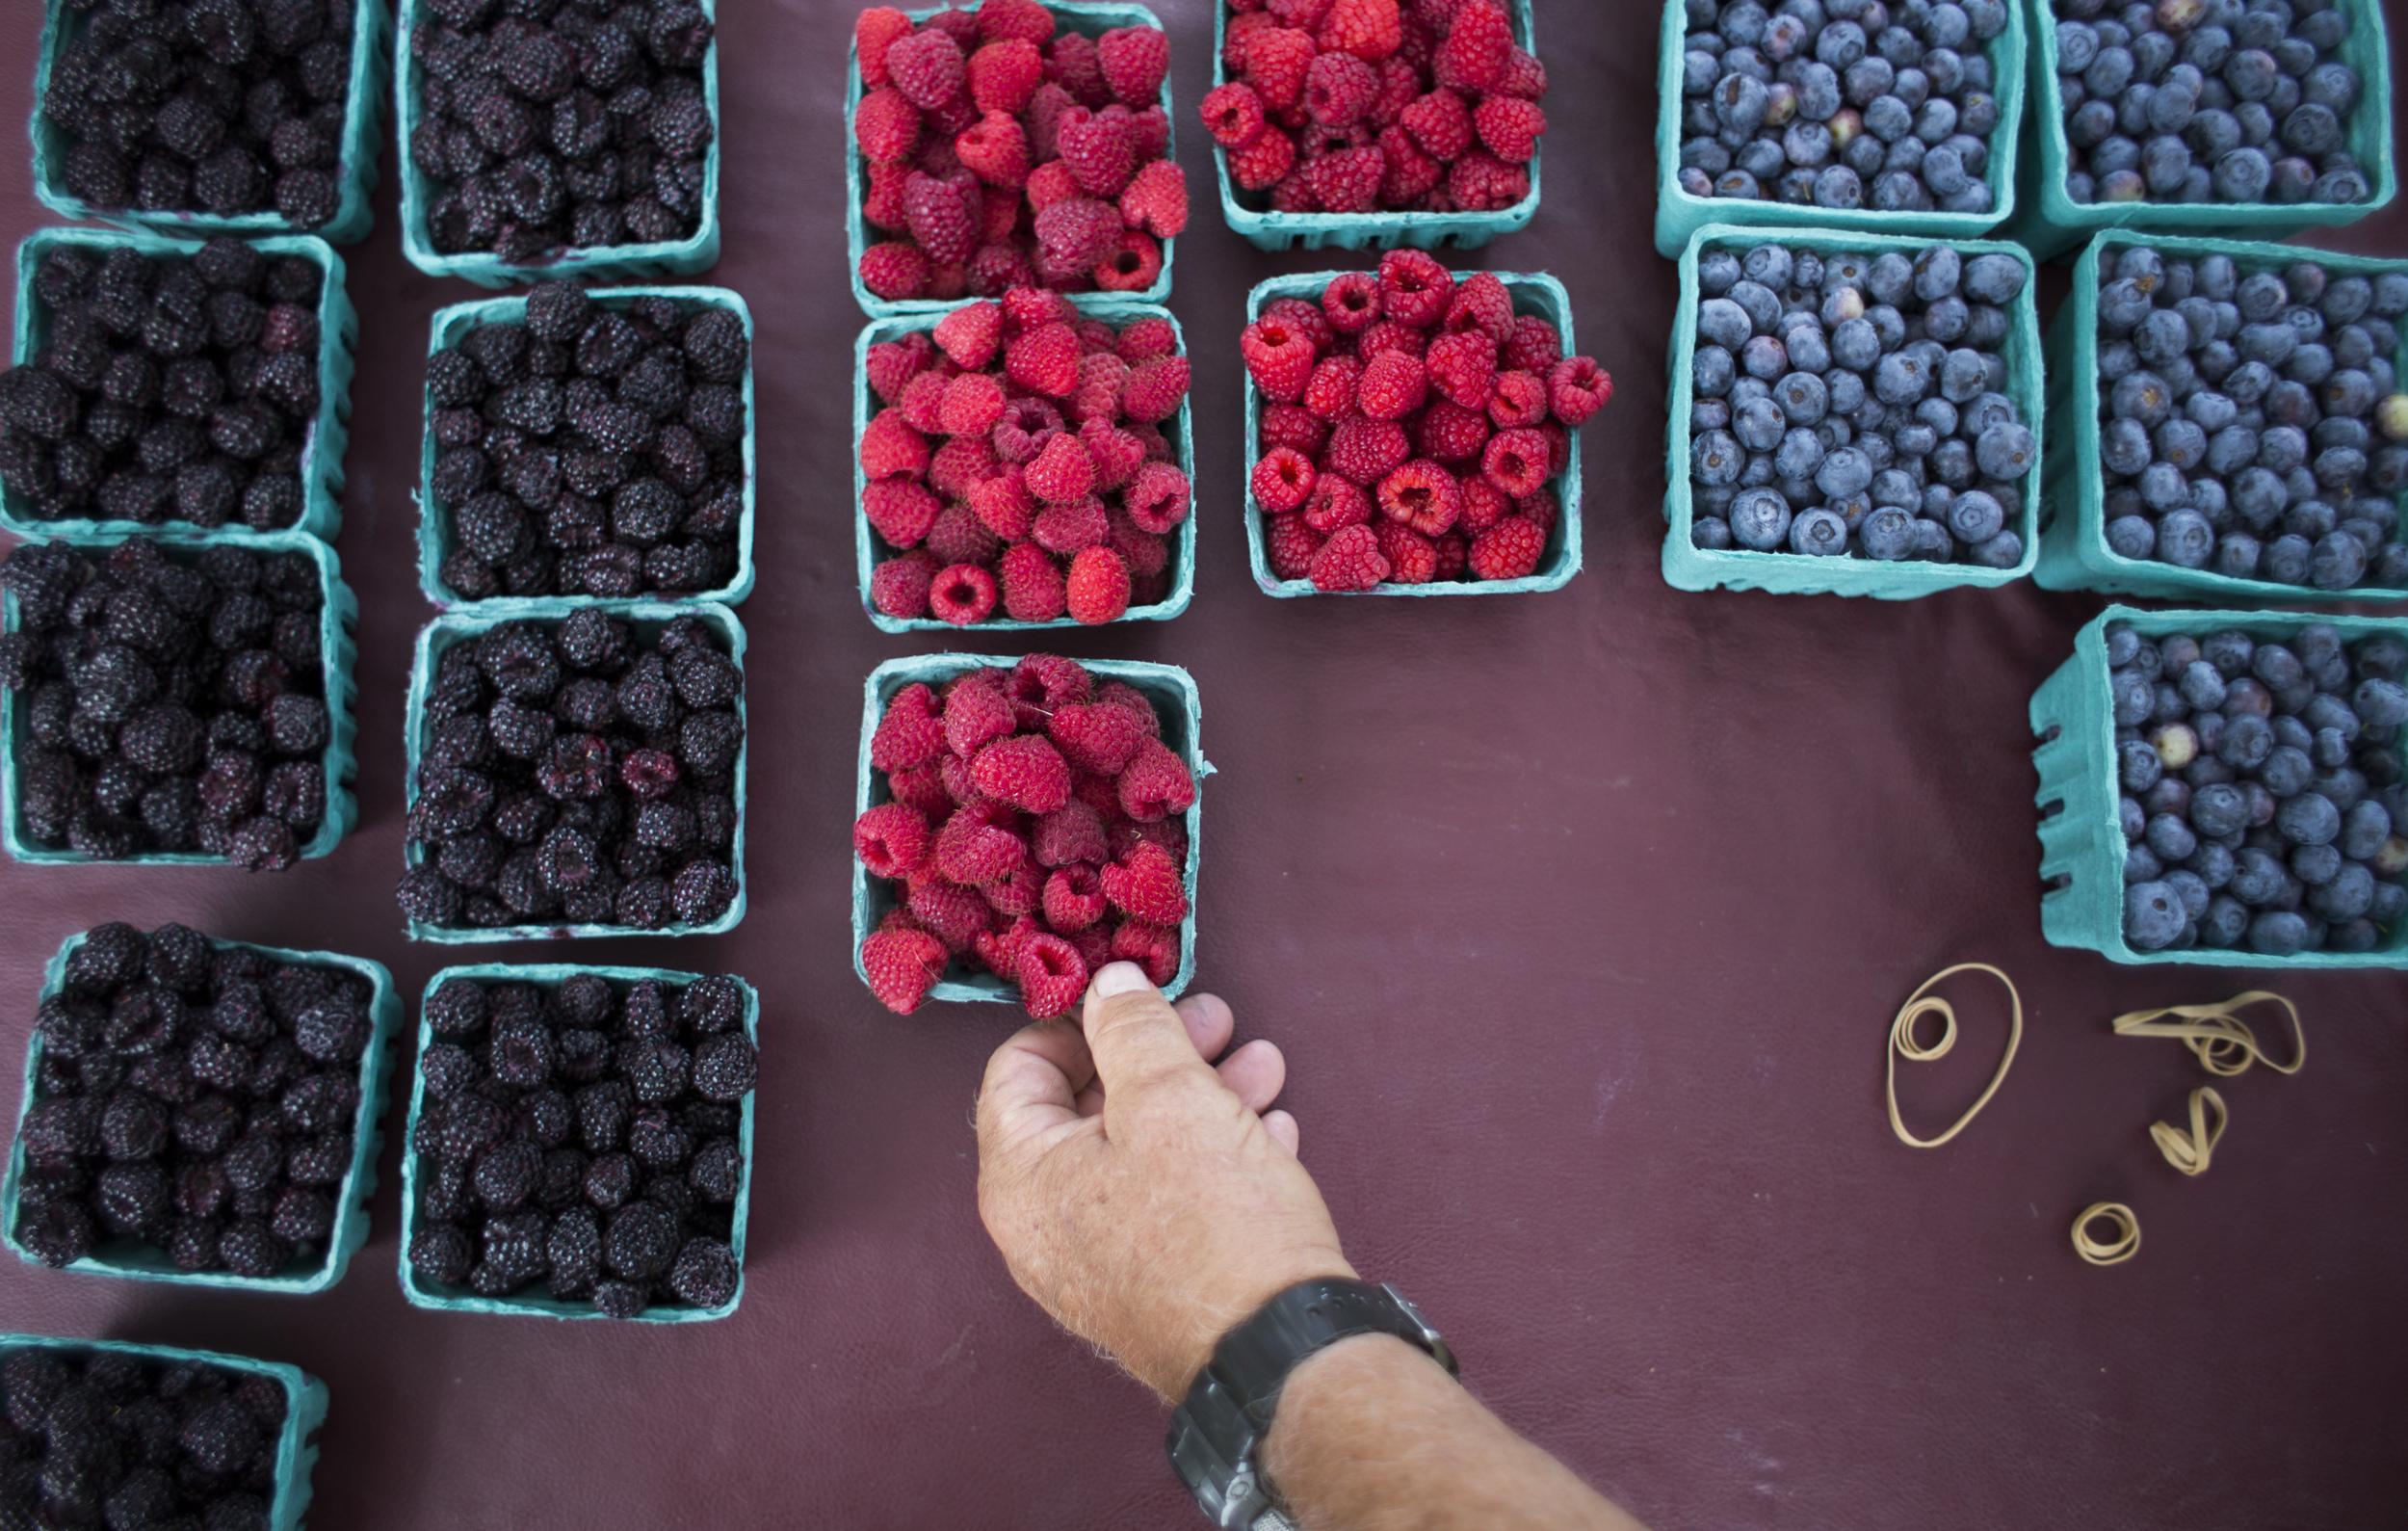 Merle Stutzman, an employee of Sand Hill Berries, sells berries at the Latrobe Farmer's Market held in Legion Keener park.